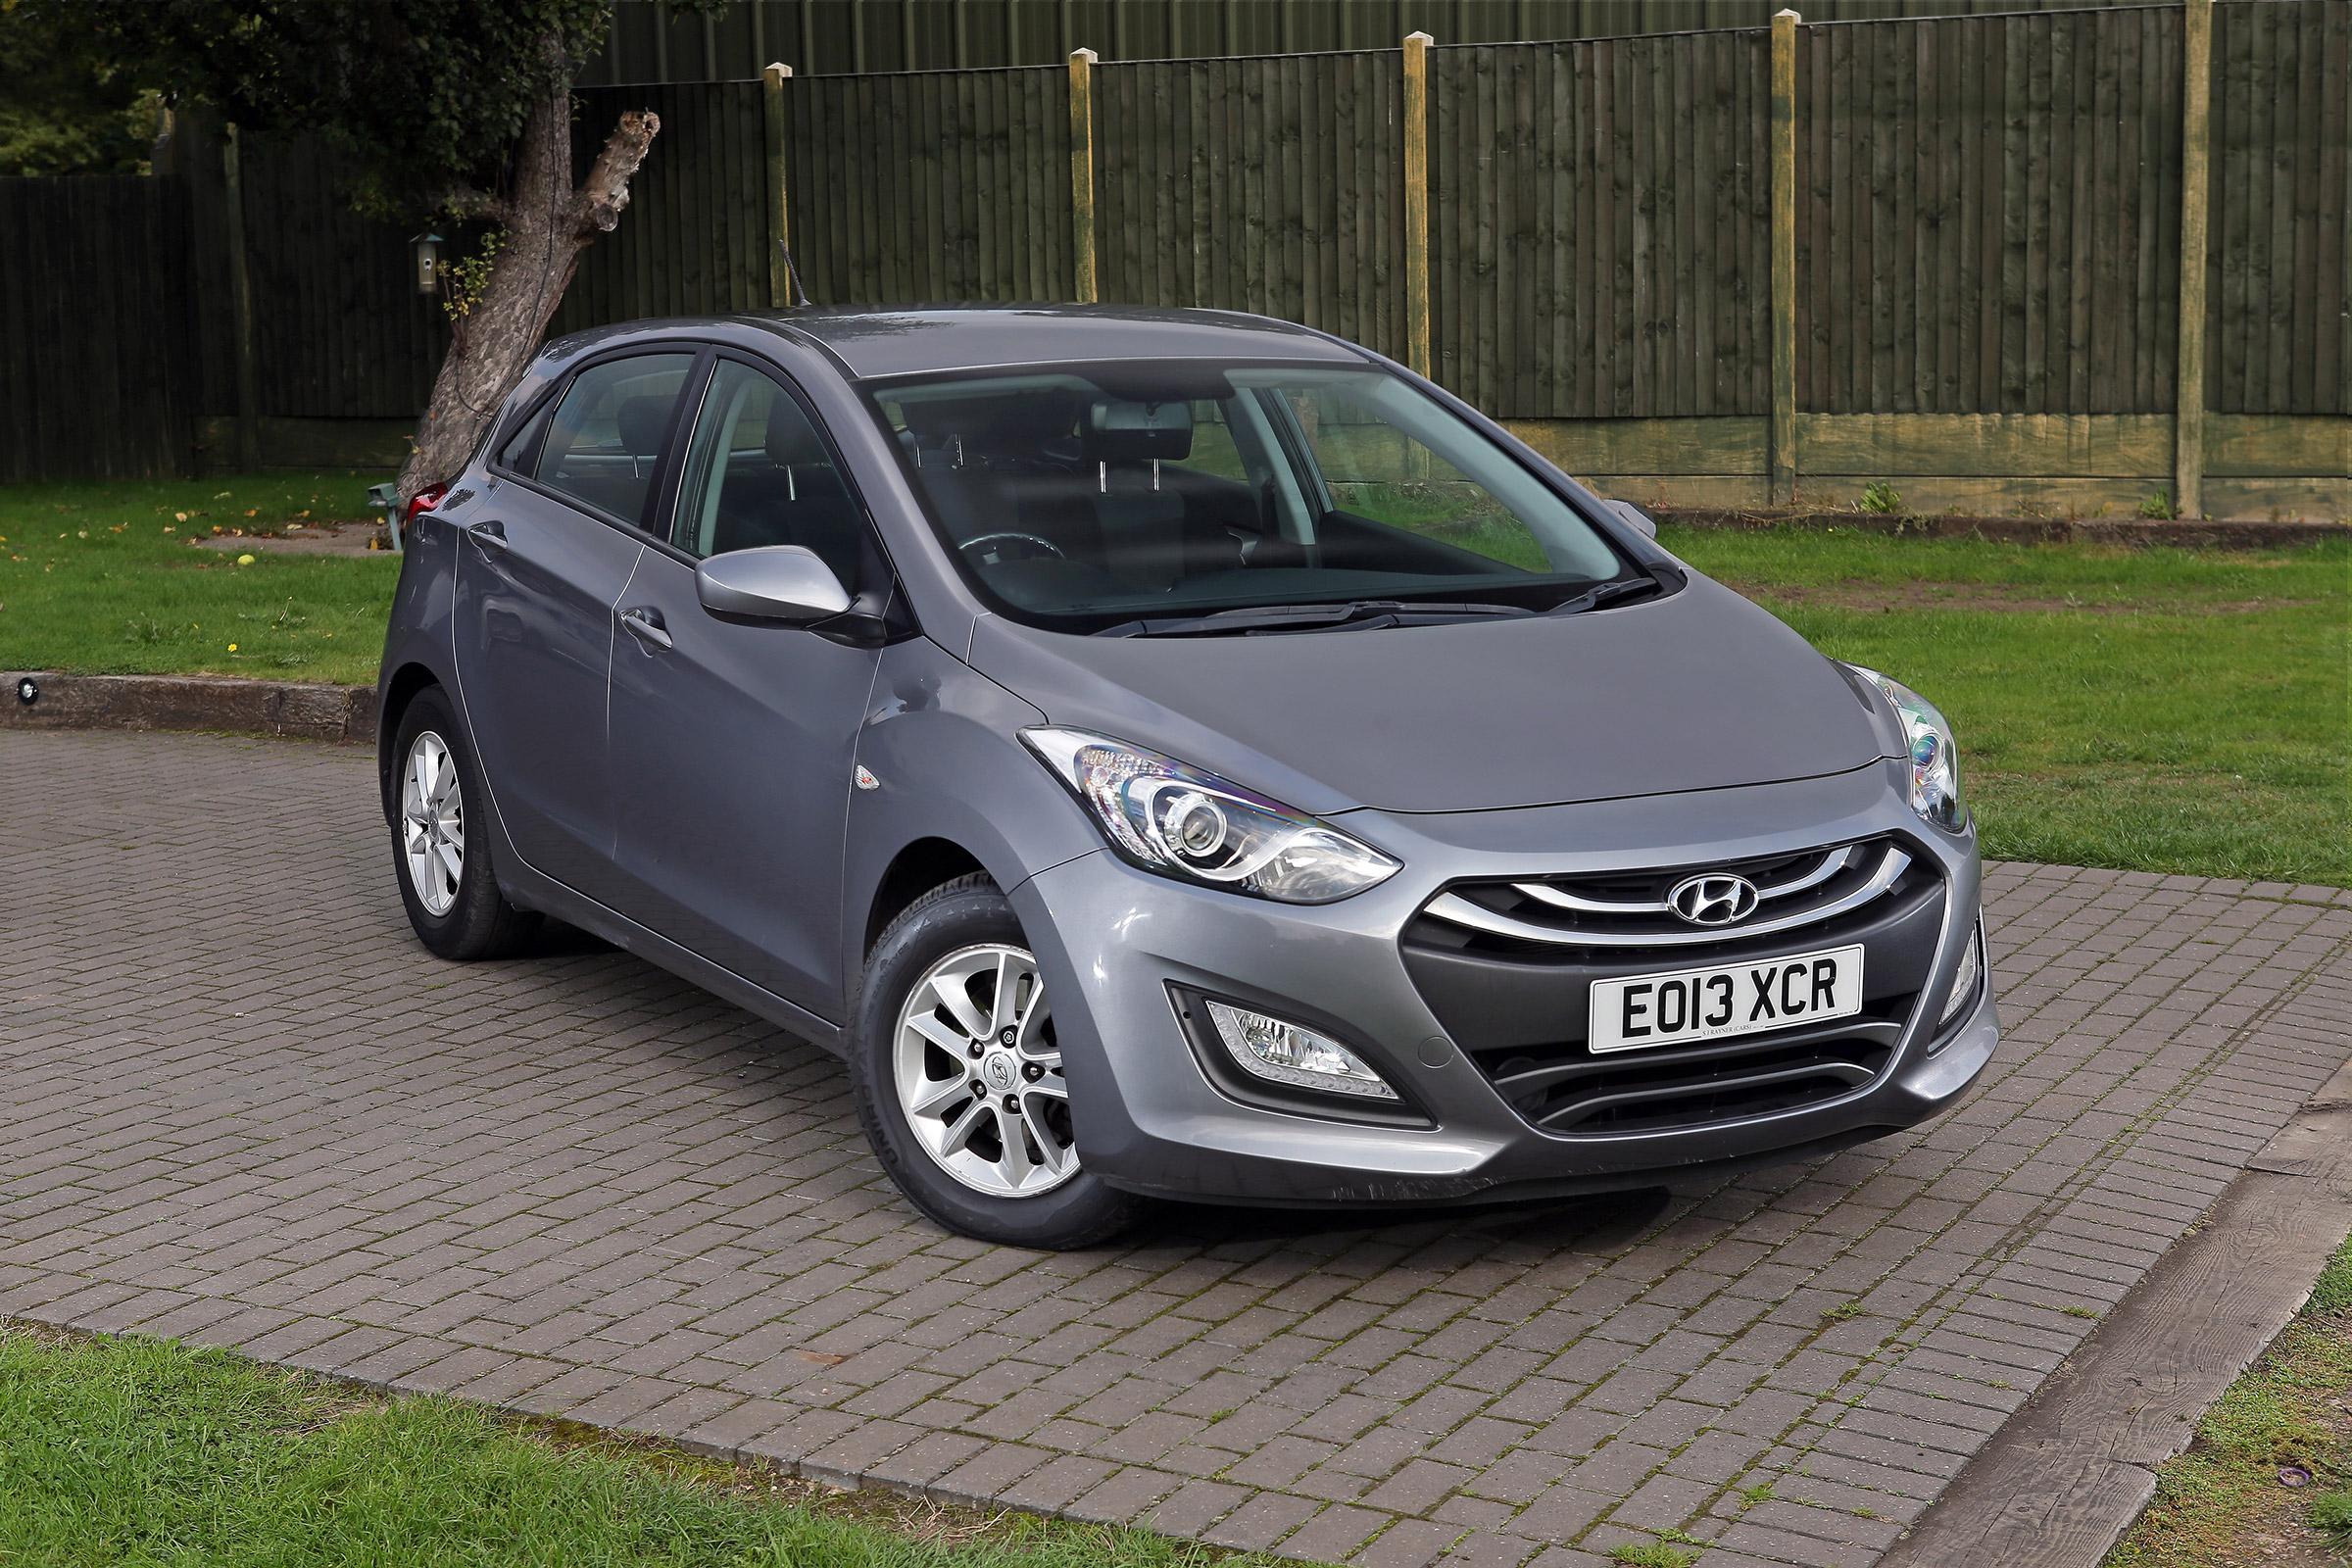 Used Hyundai i30 review | Auto Express